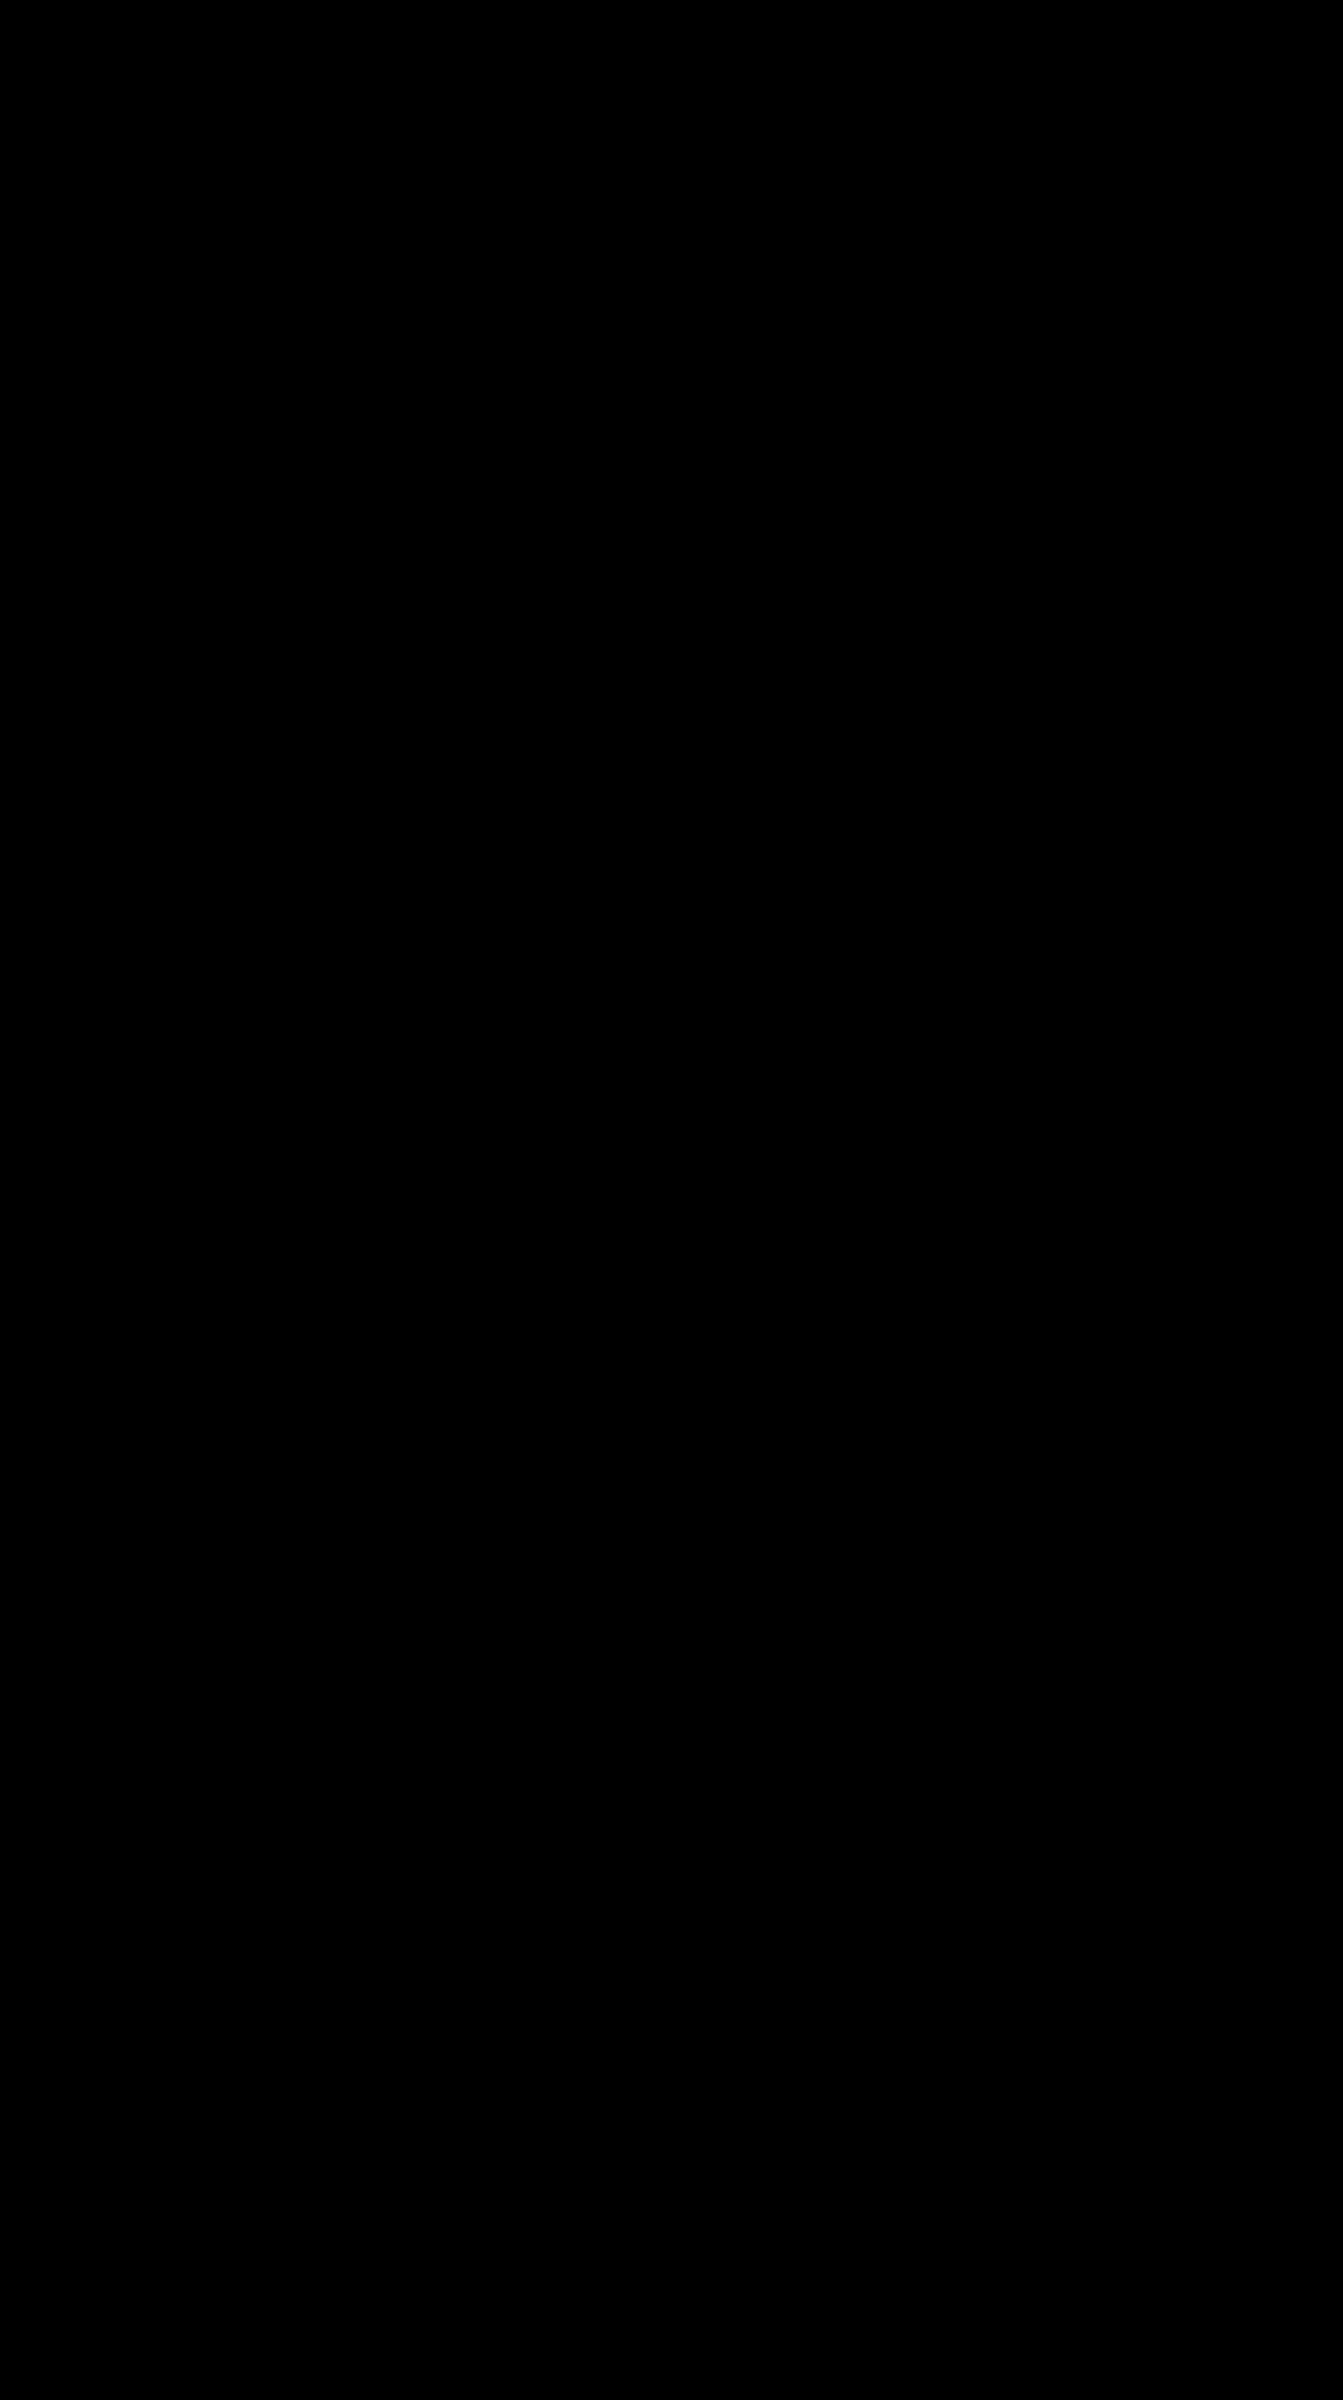 Clipart. Light bulb clip art silhouette